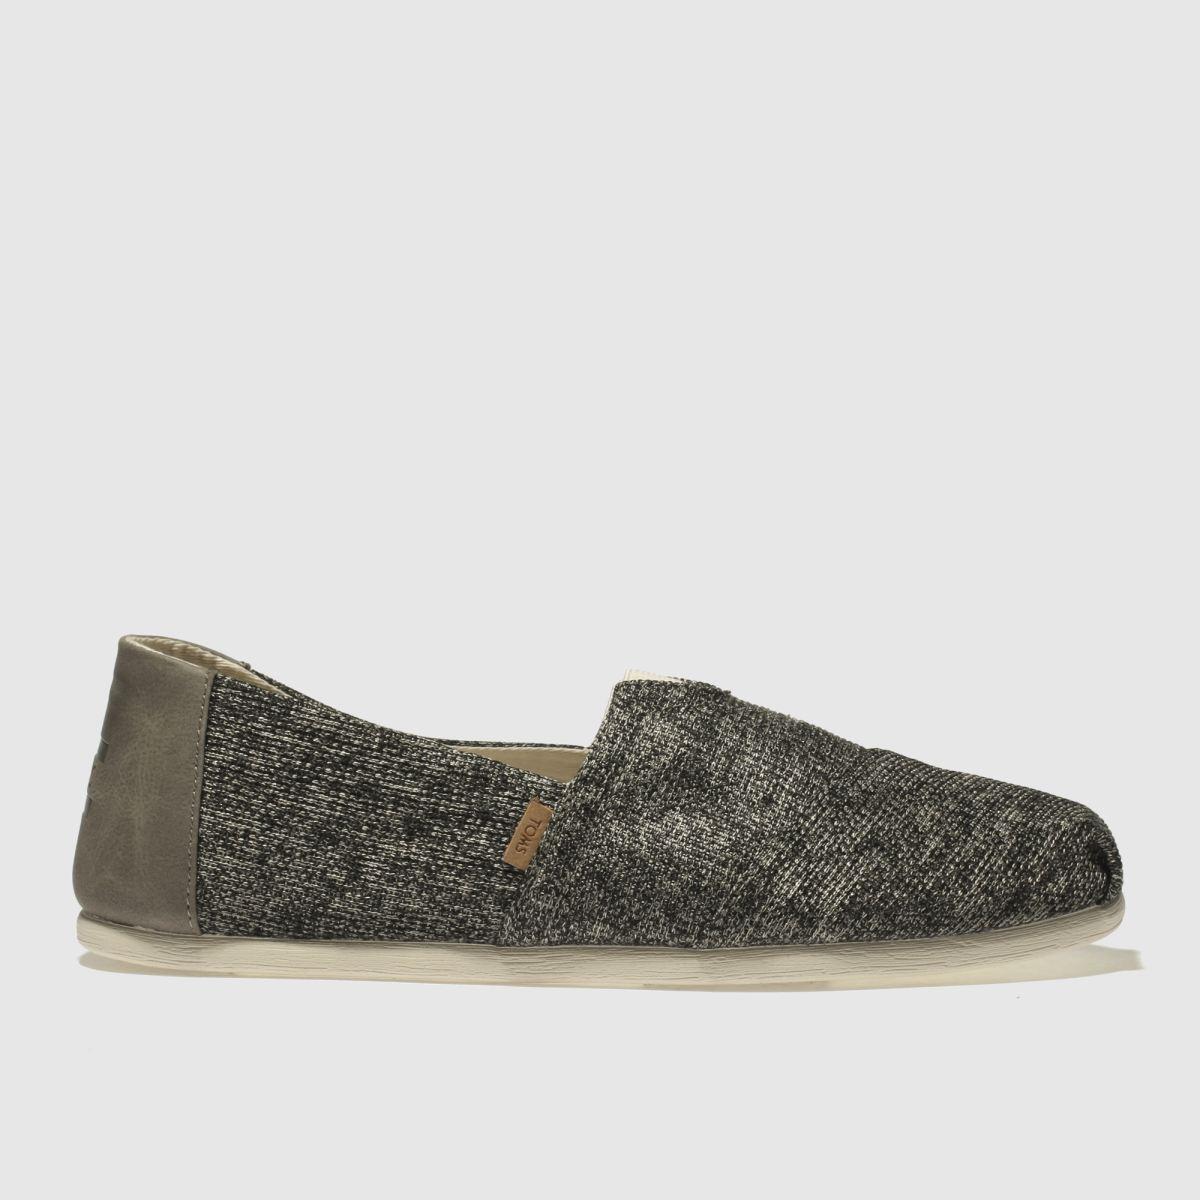 Toms Grey Seasonal Classic Shoes